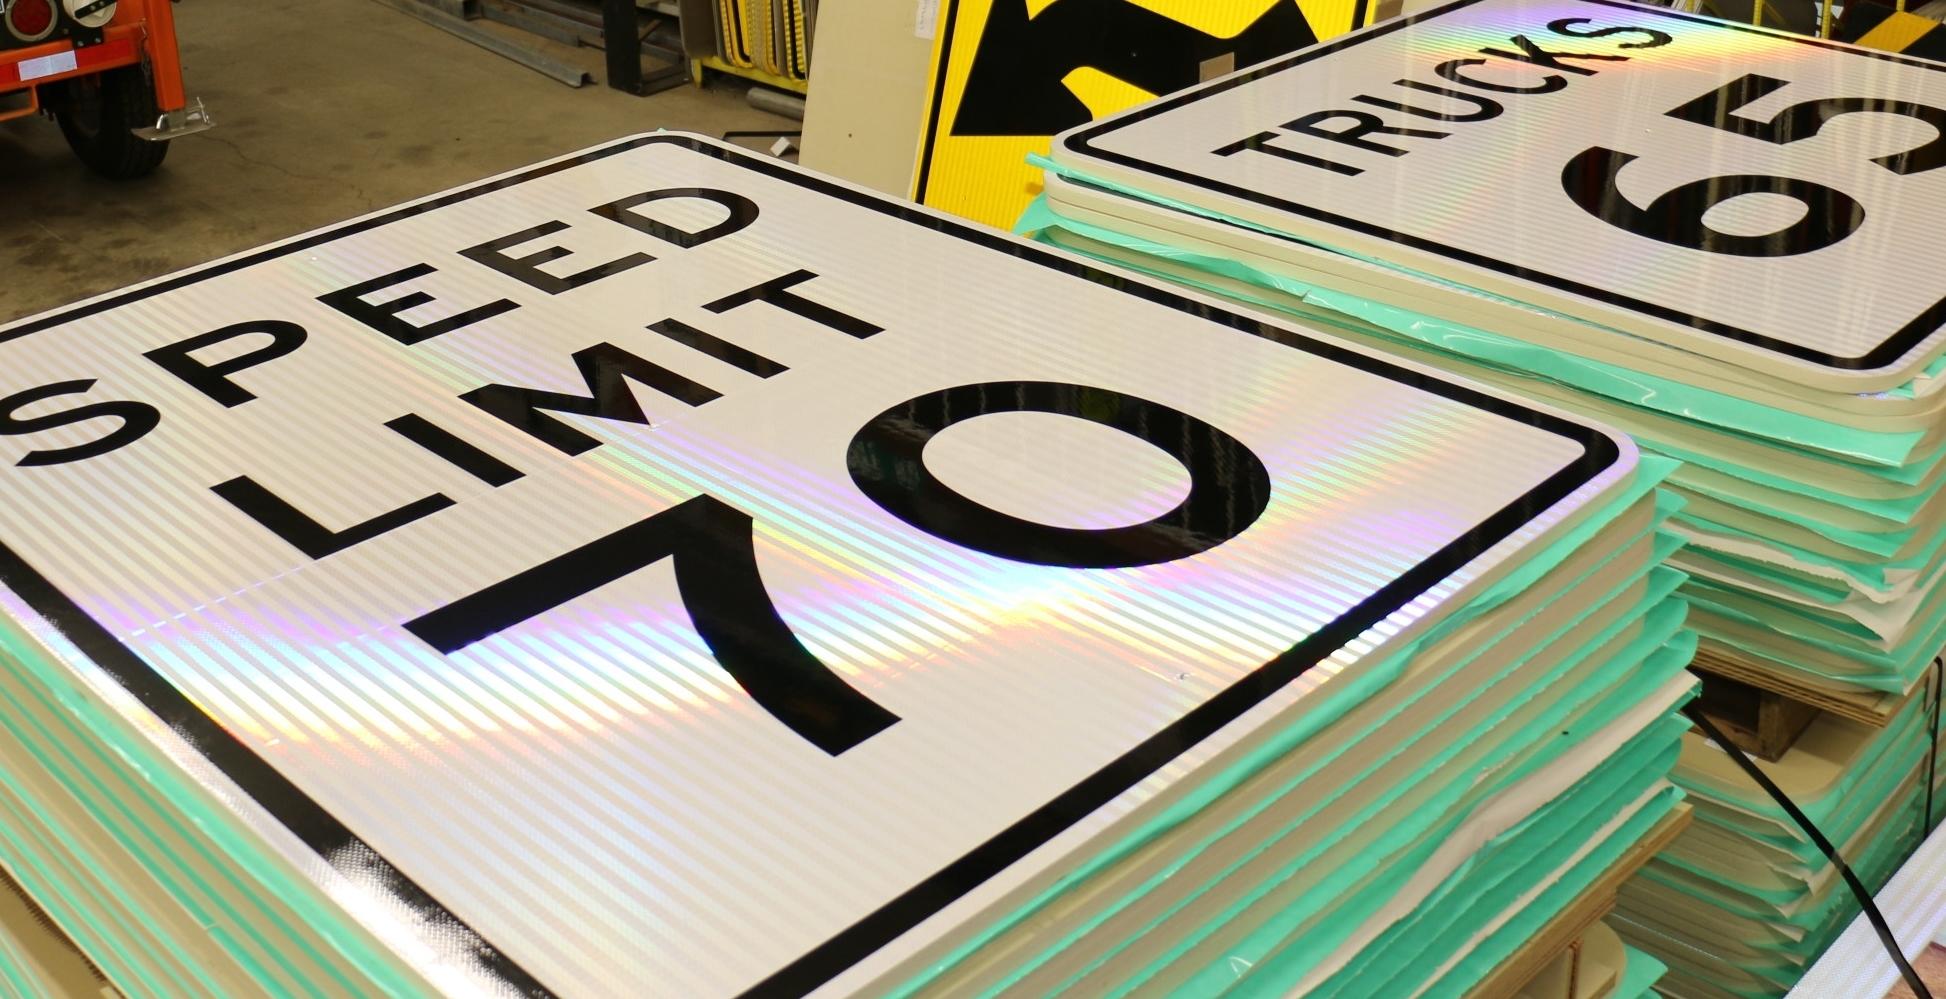 Virginia Senate Passes Bill to Raise Reckless Driving Threshold